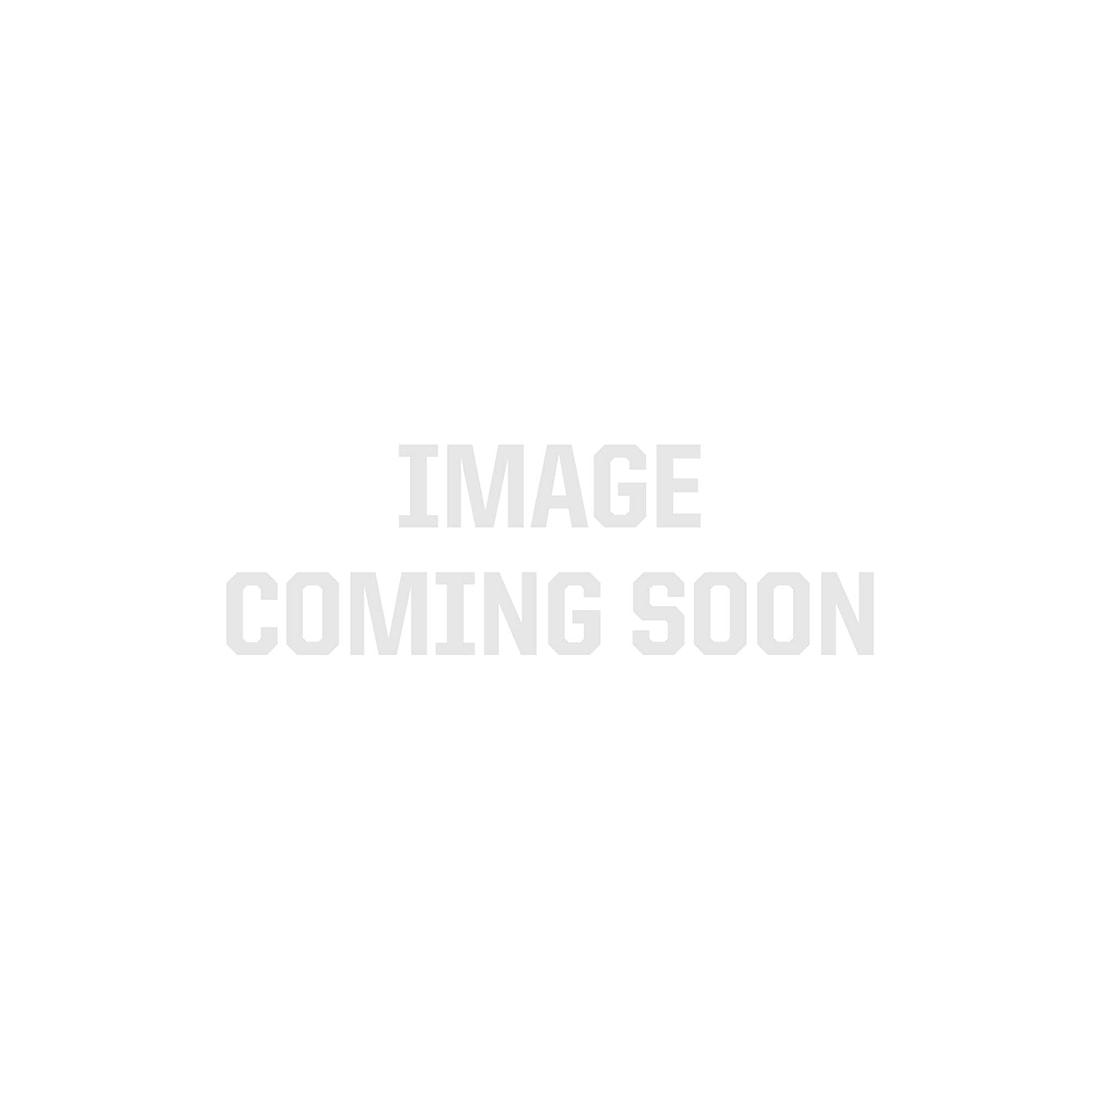 Wall Mount White Adjustable LED Controller Pro (Rotary Knob - White, US Size)